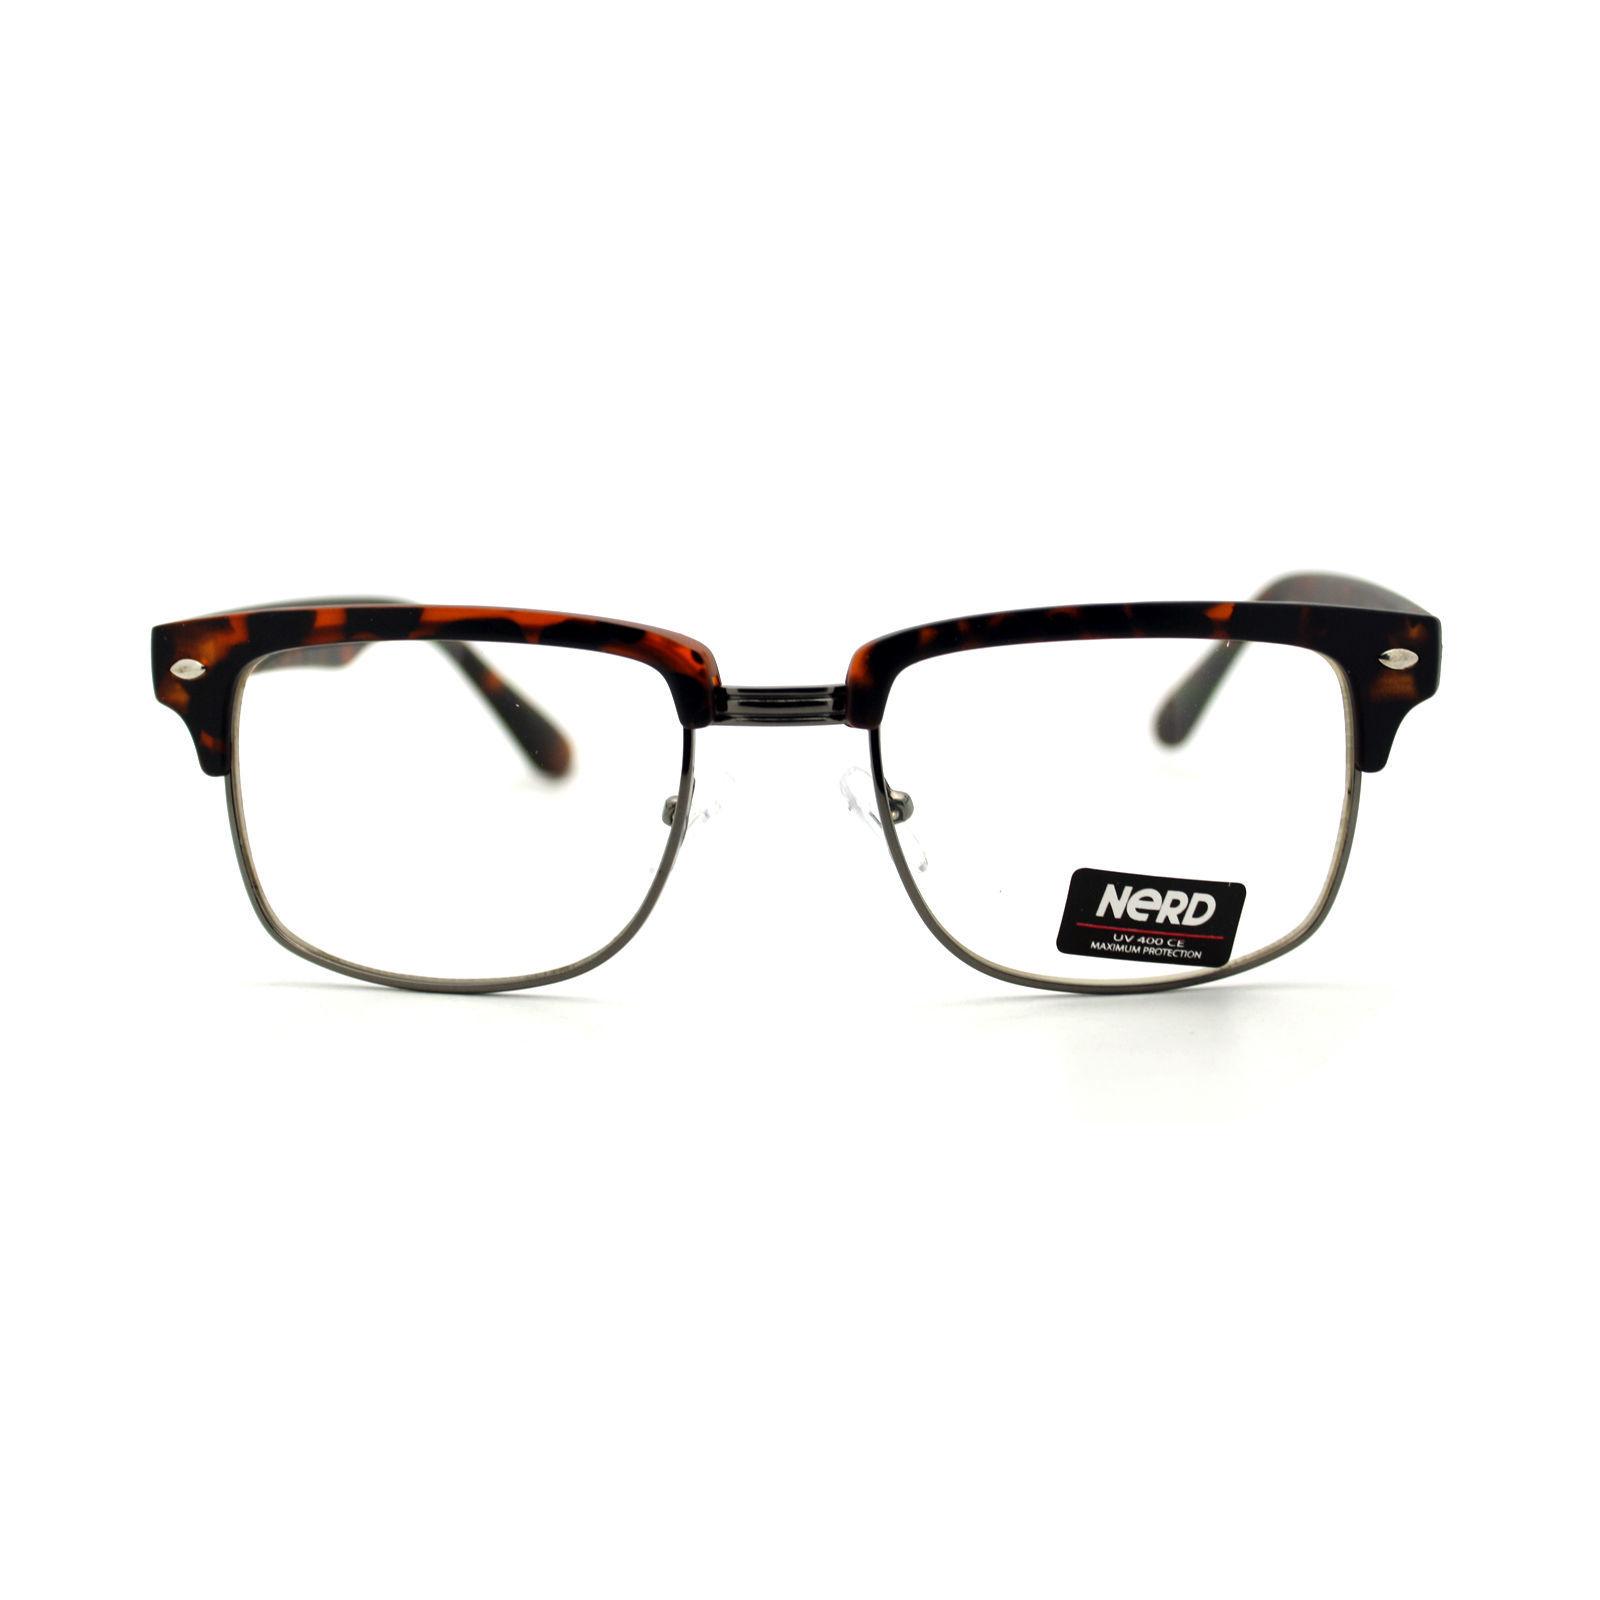 Designer Fashion Eyeglasses Half Metal Plastic Top Square Frame Glasses